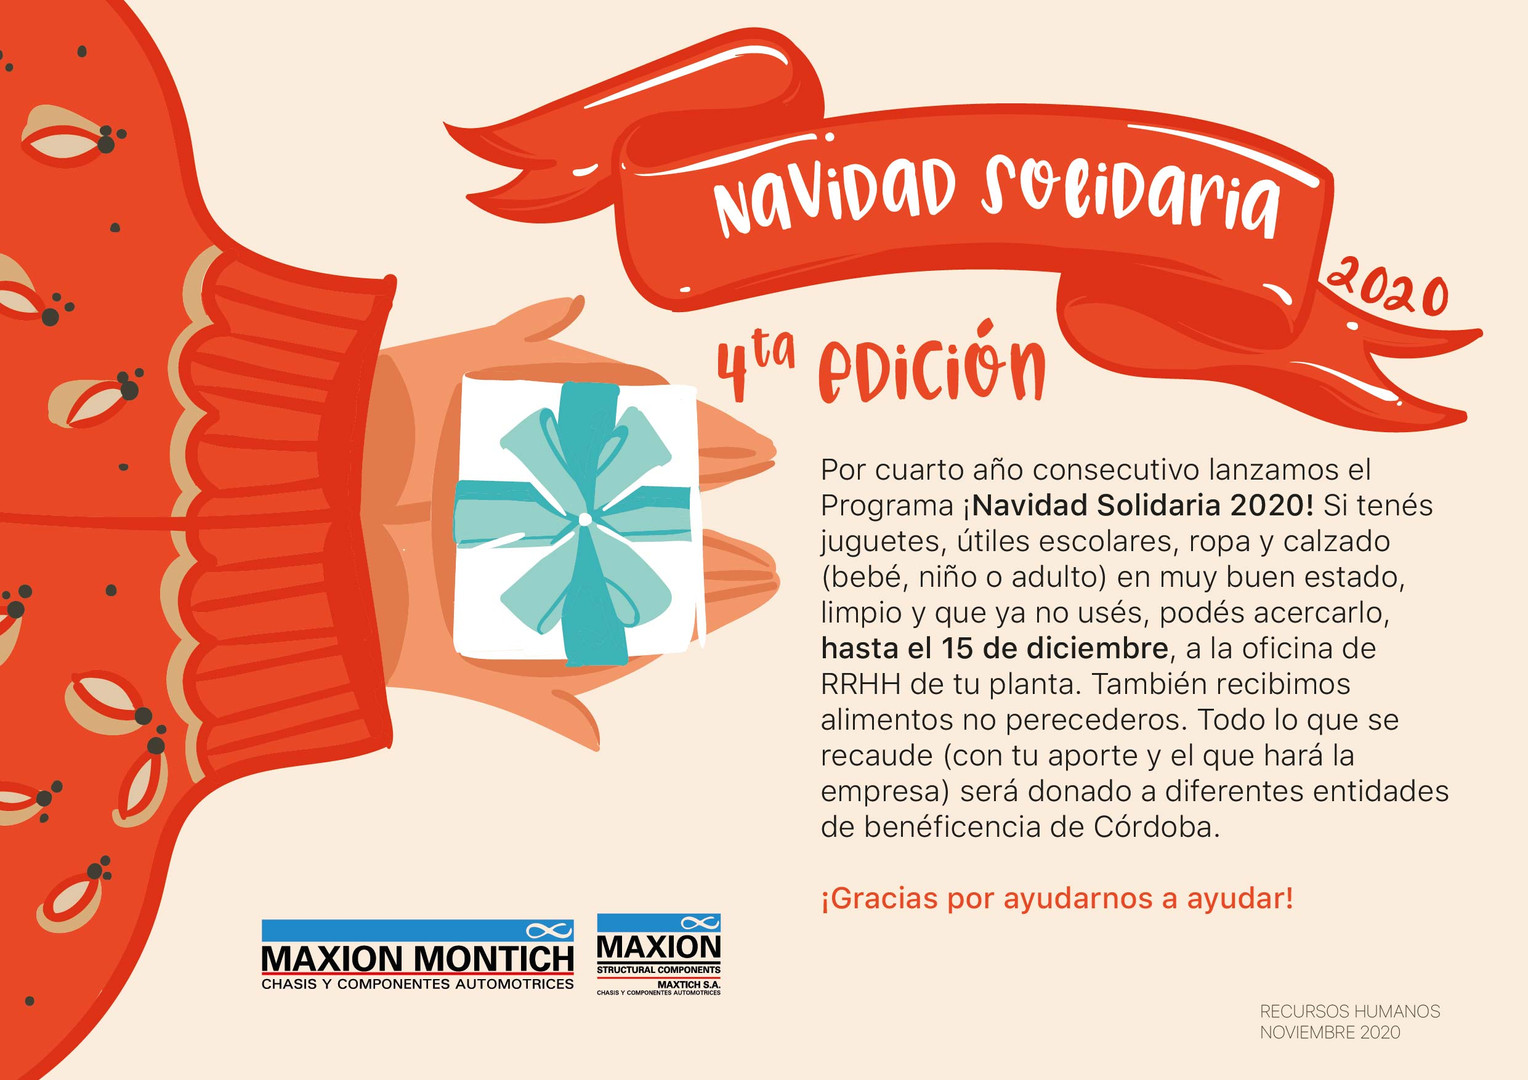 Navidad Solidaria 2020